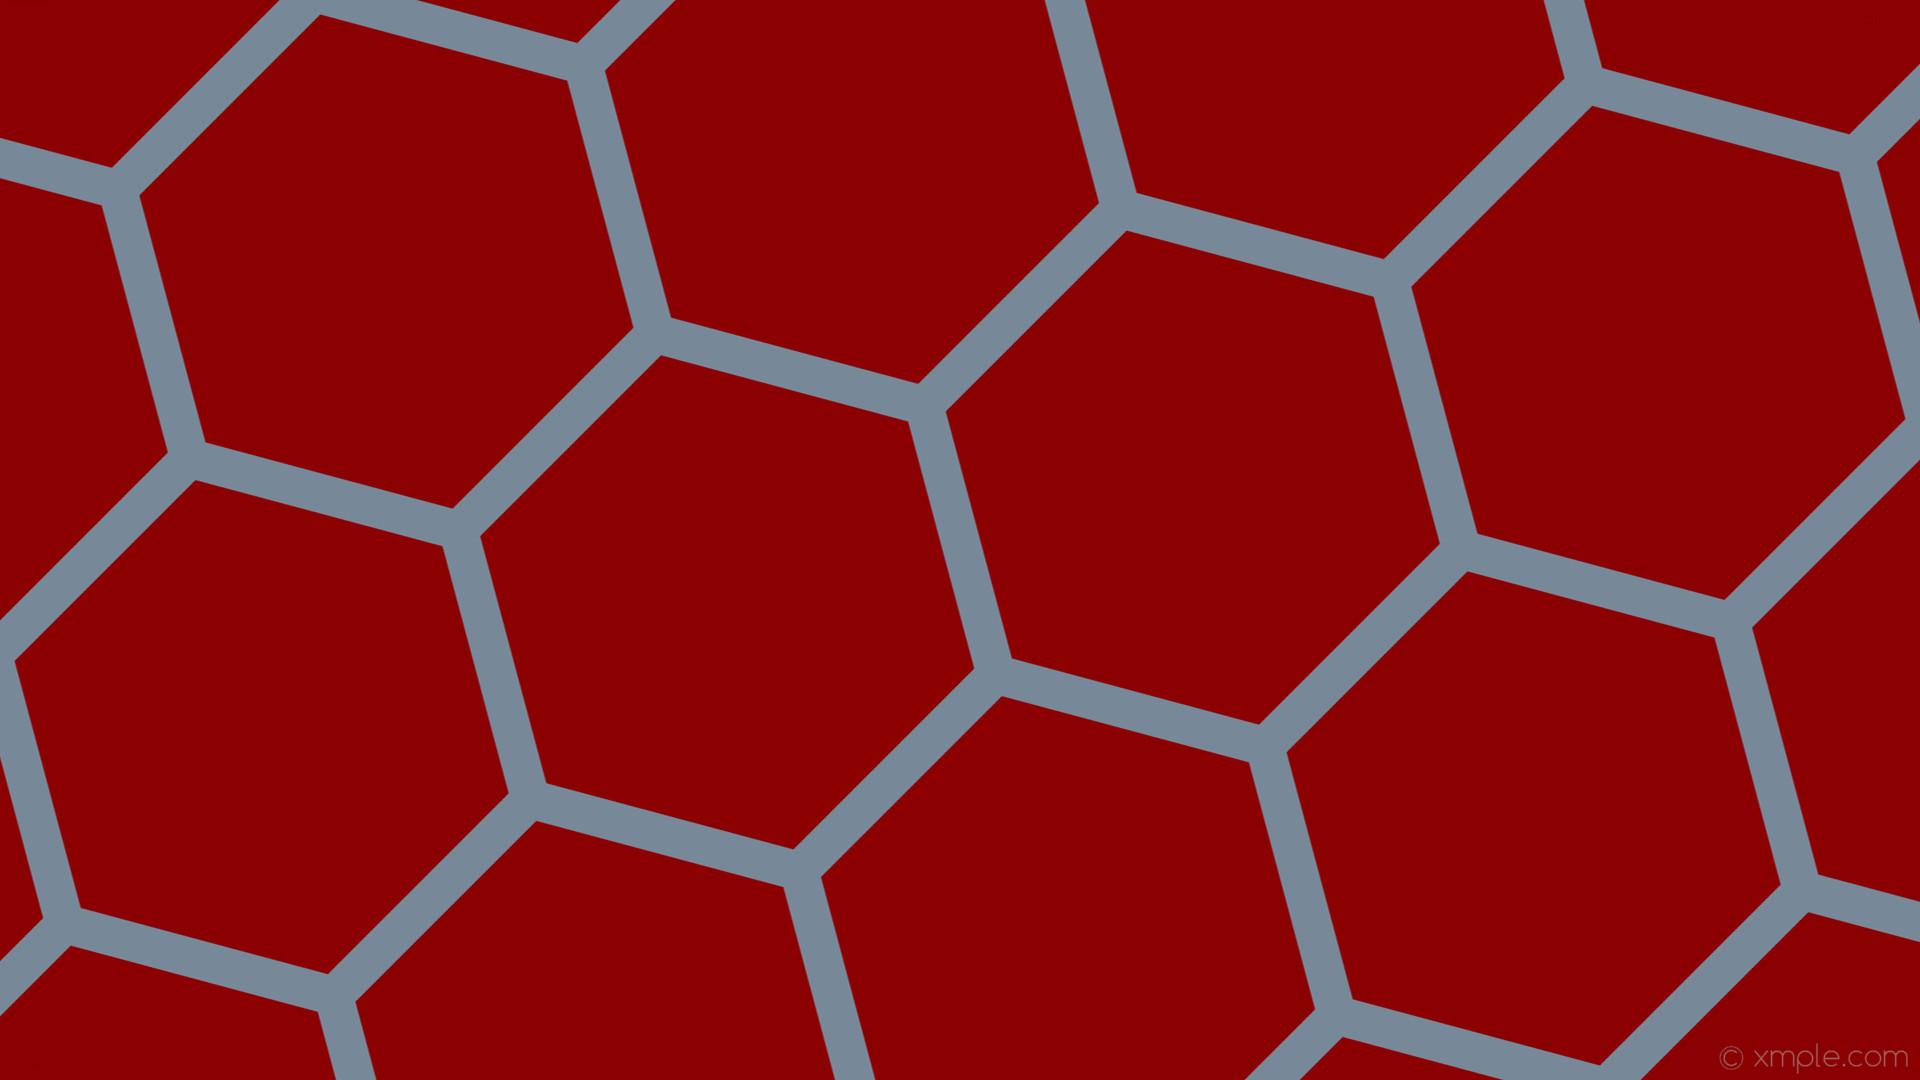 wallpaper grey red hexagon honeycomb beehive dark red light slate gray  #8b0000 #778899 diagonal